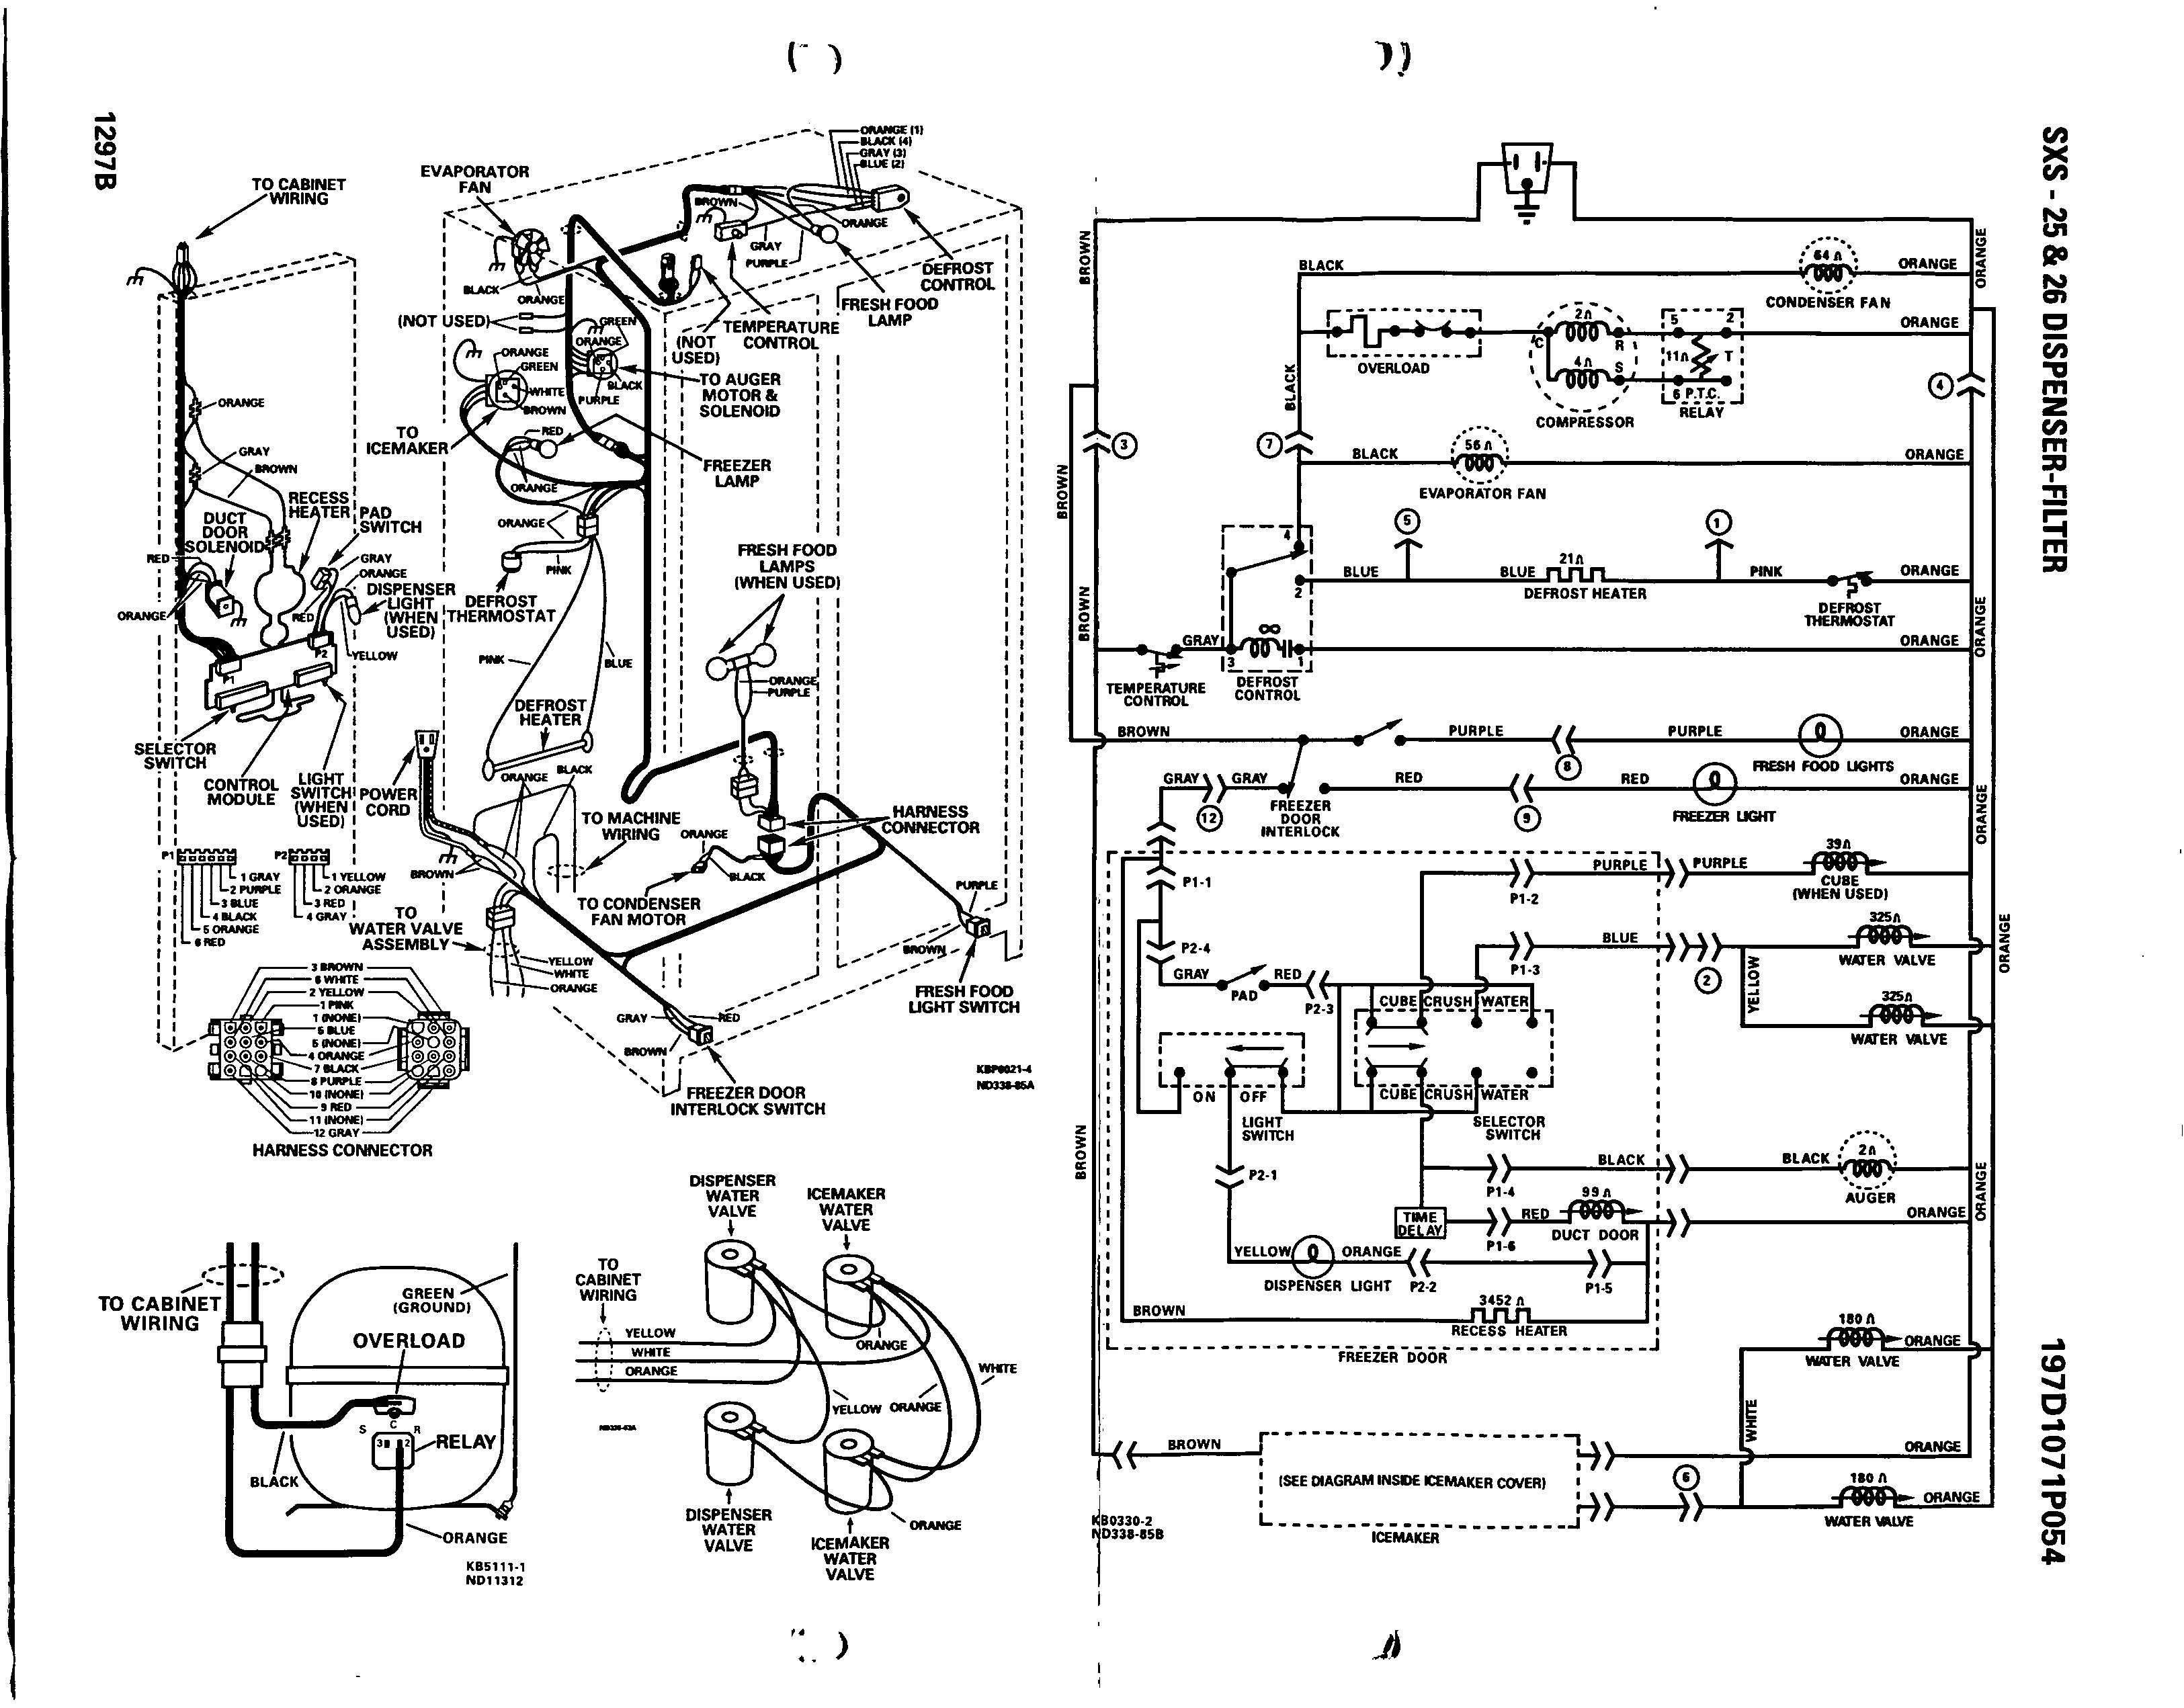 Ge Refrigerator Wiring Diagram Ice Maker Best Wiring Diagram for Kitchenaid Ice Maker Fresh Wiring Diagram